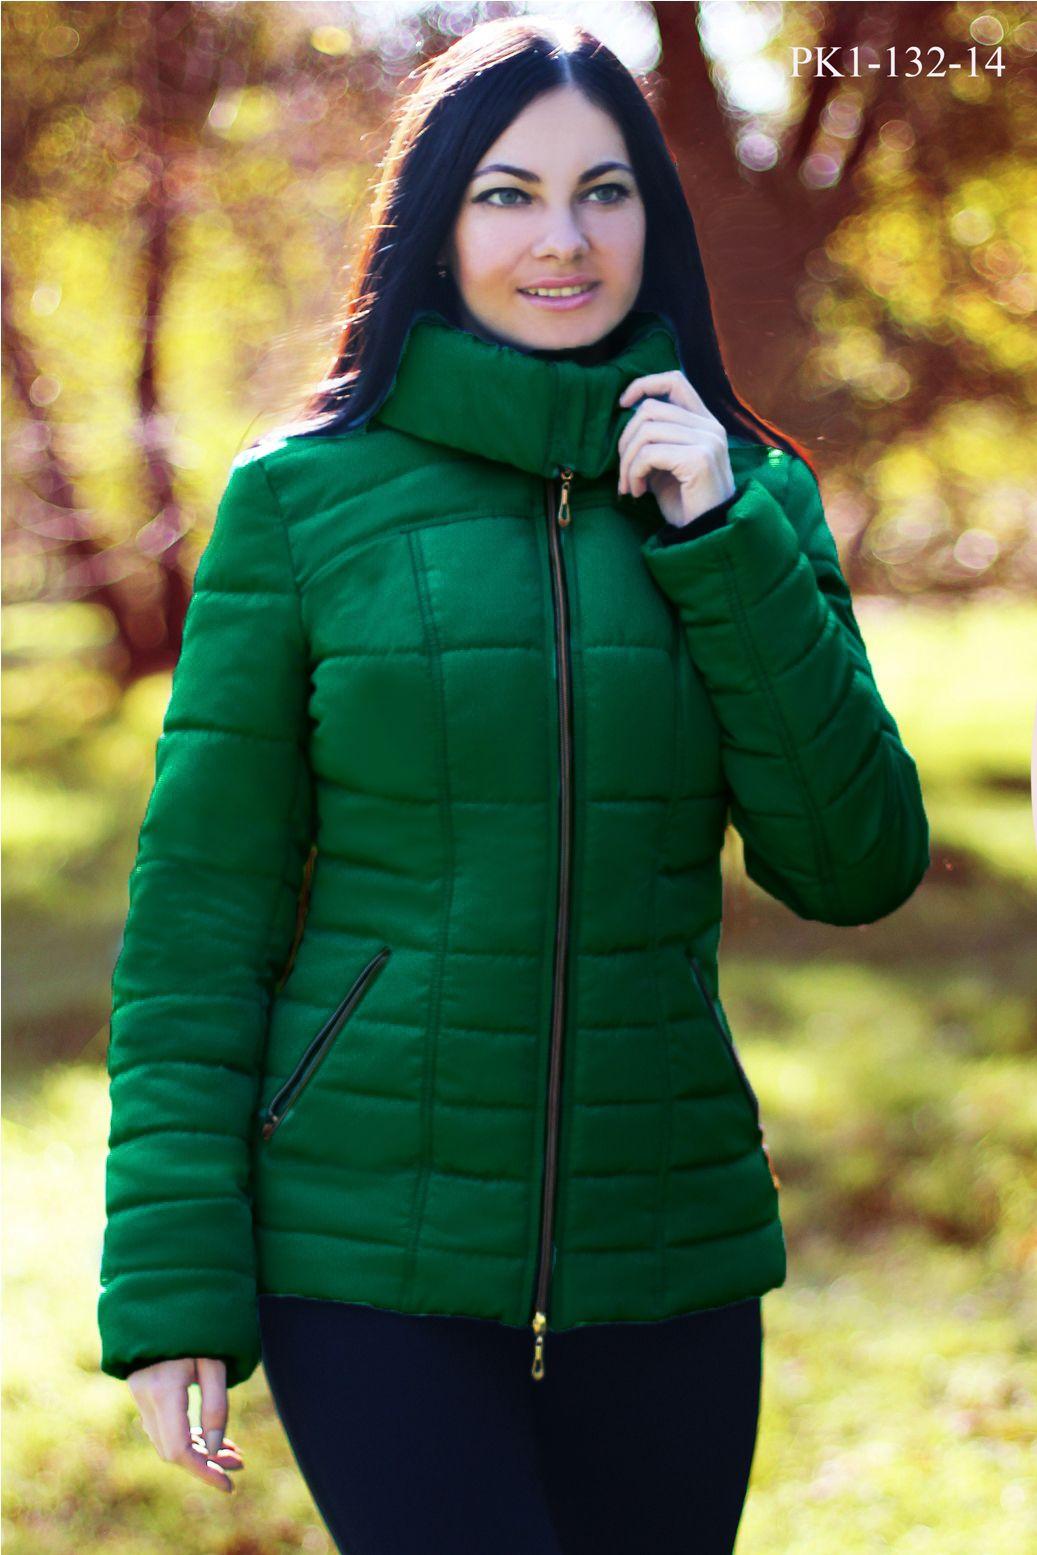 Куртка PK1-132 купить на сайте производителя